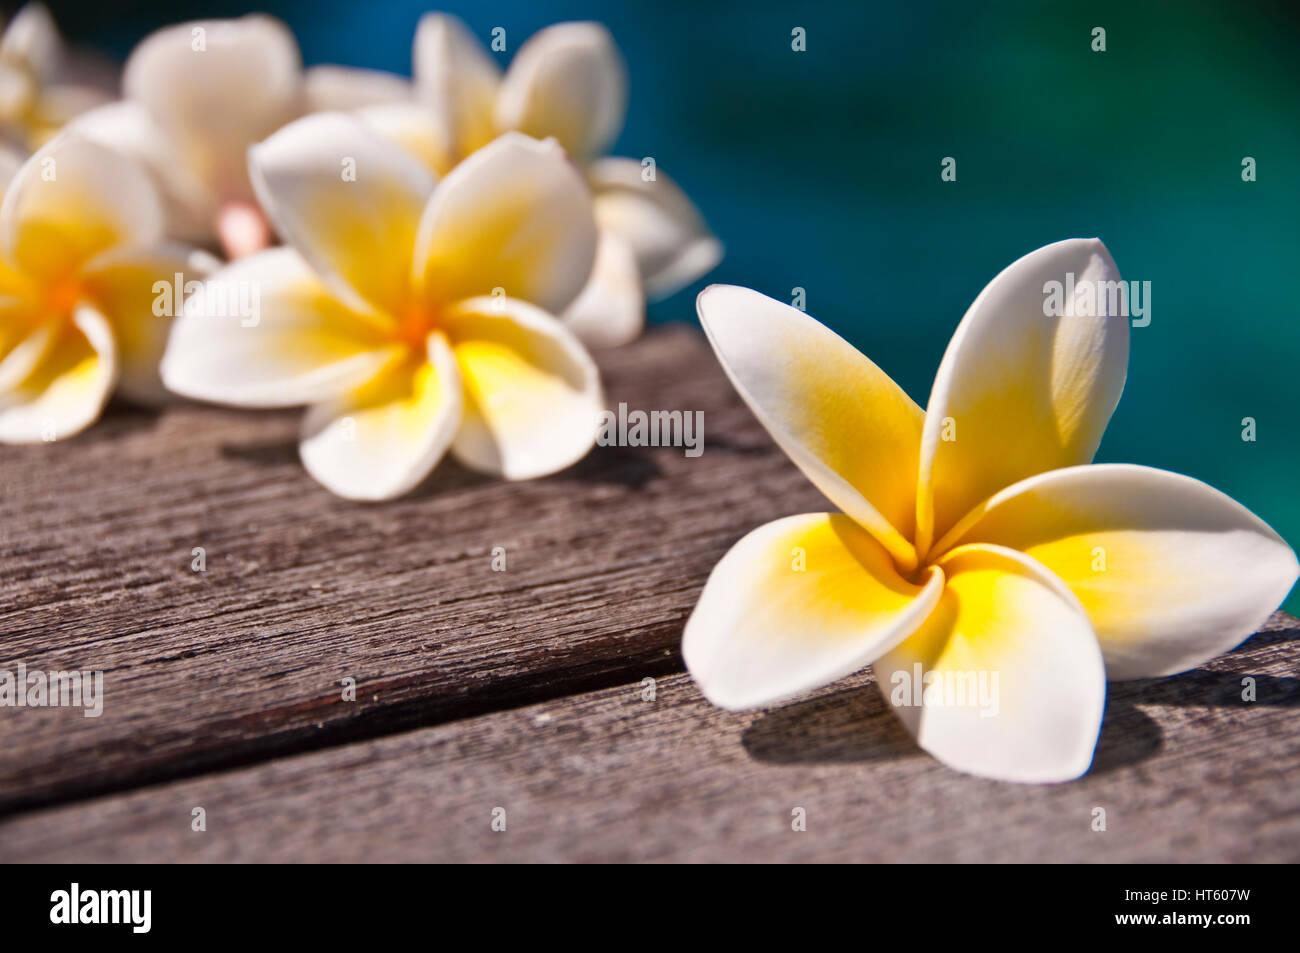 Plumeria flores sobre el piso de madera, Fondo de agua azul Imagen De Stock